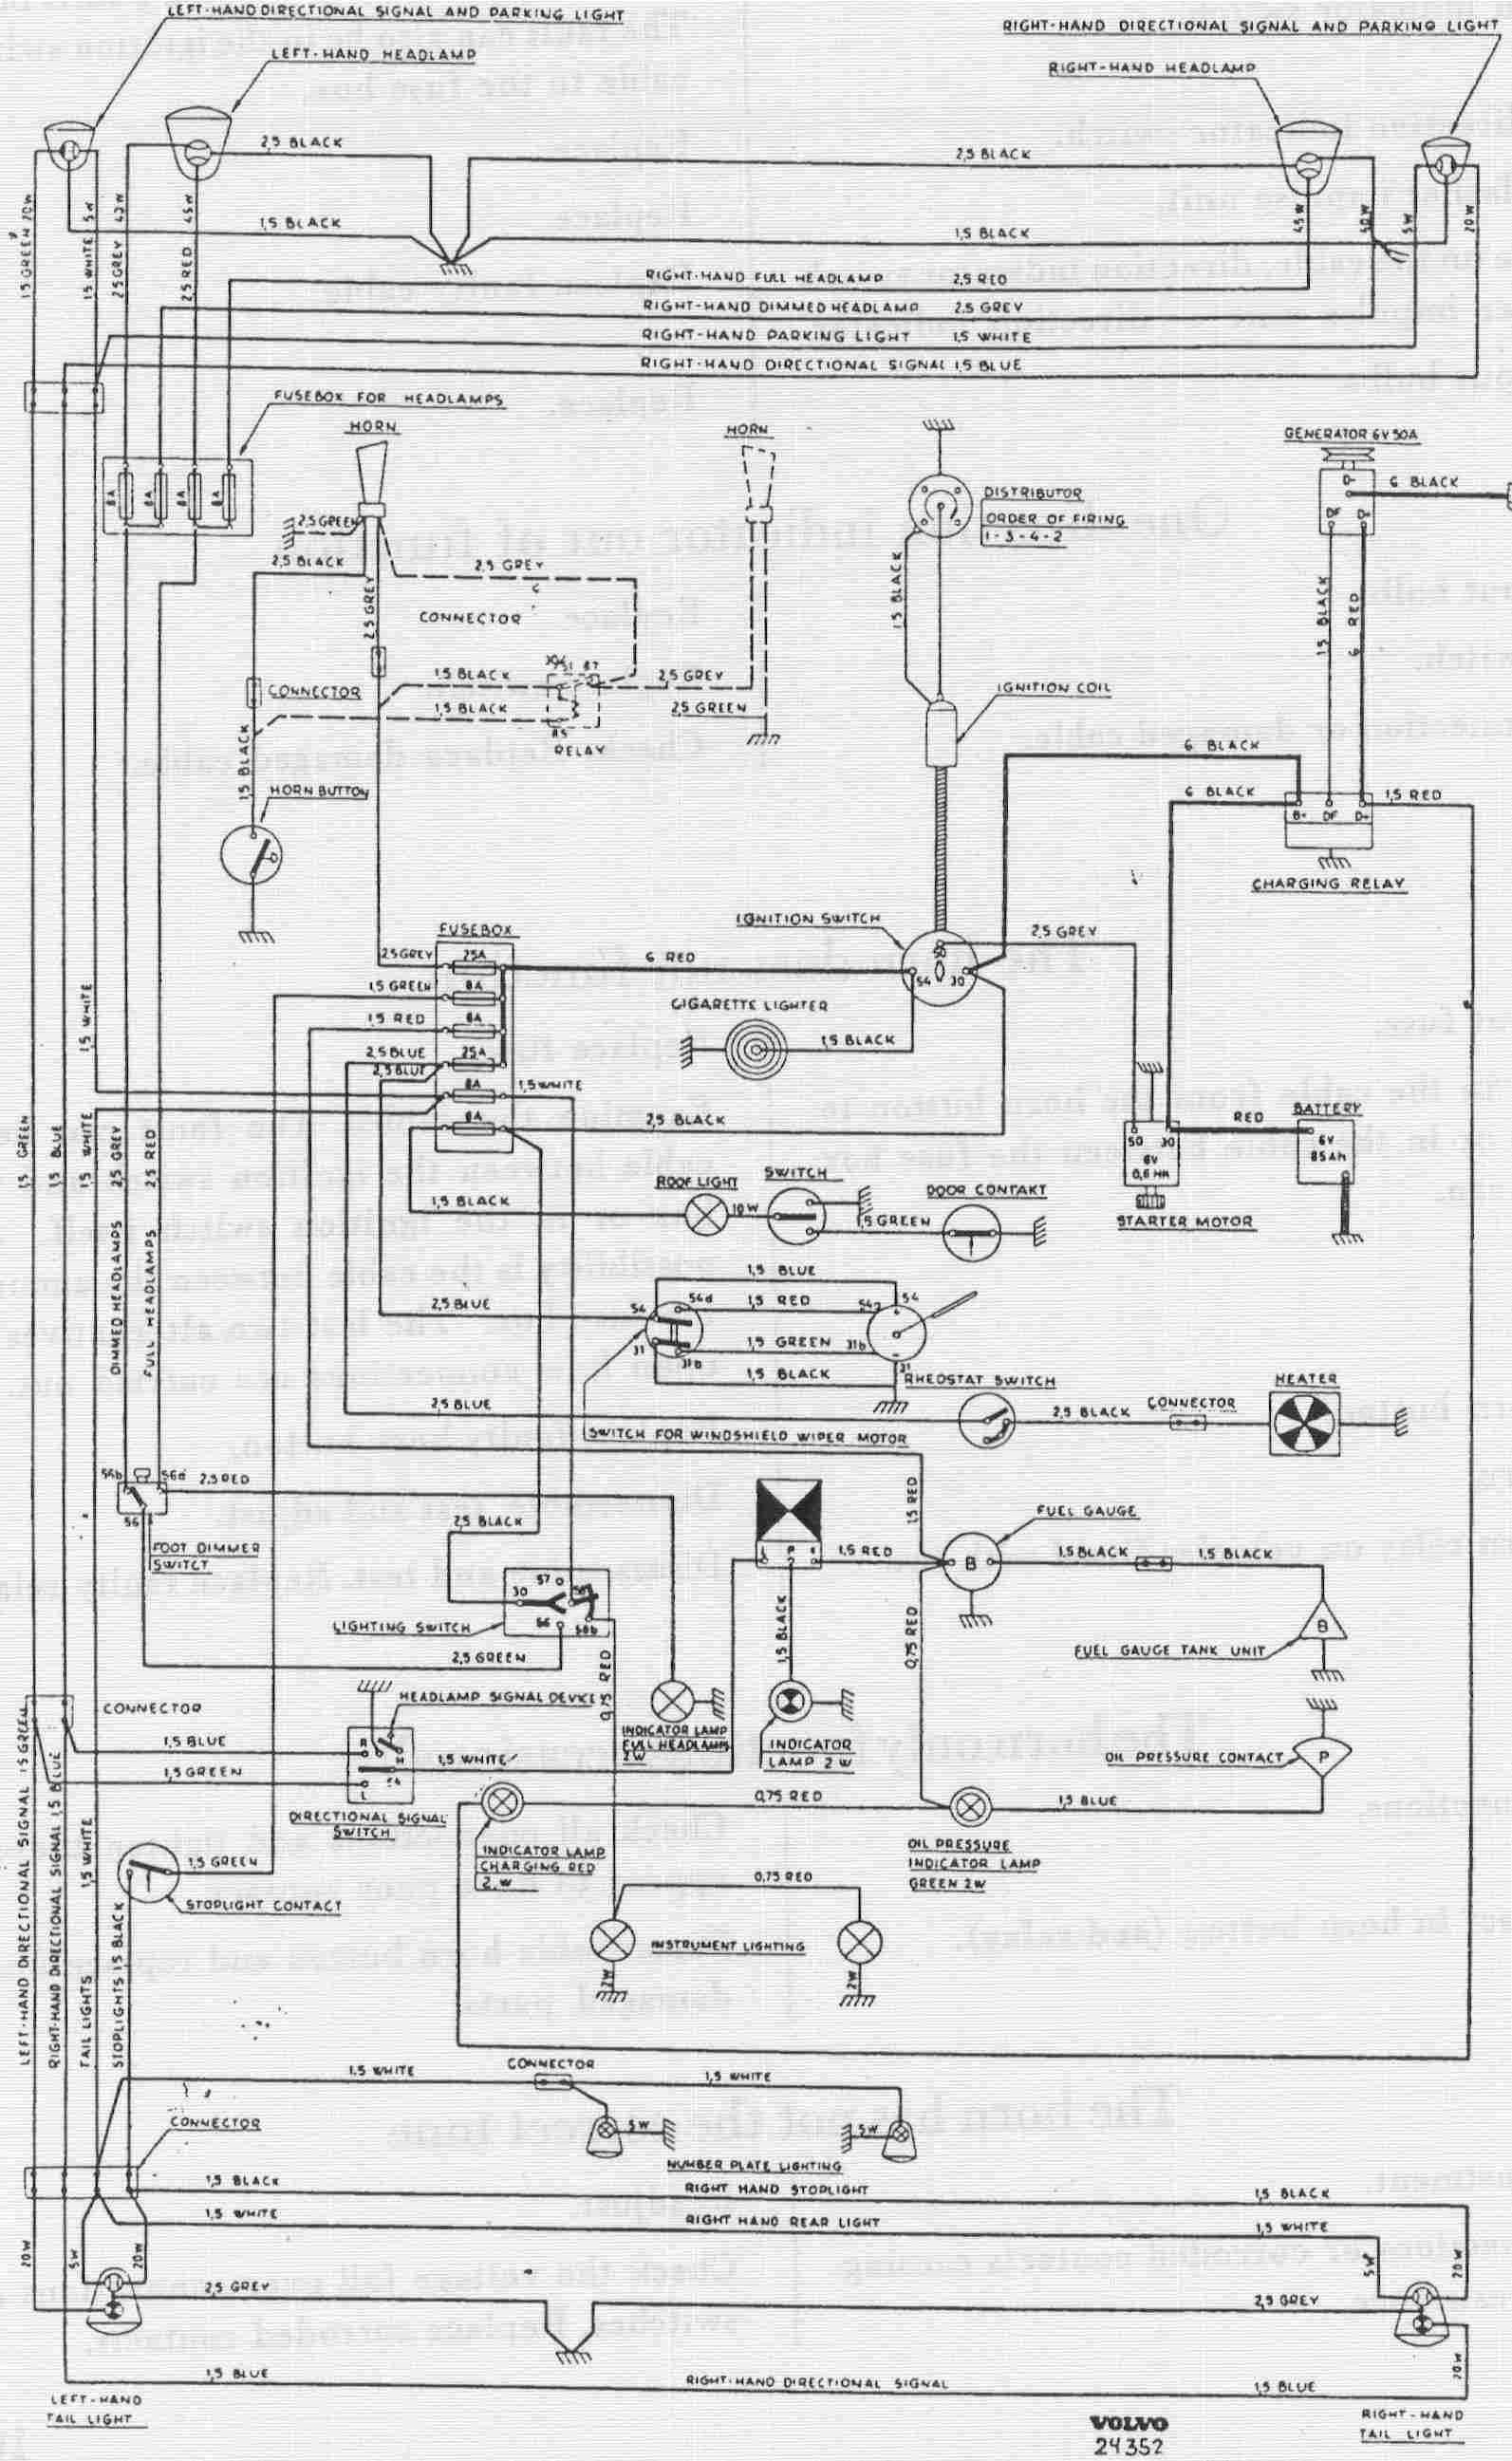 Exelent Peterbilt 386 Wiring Diagram For Washer Reserve Ensign ...